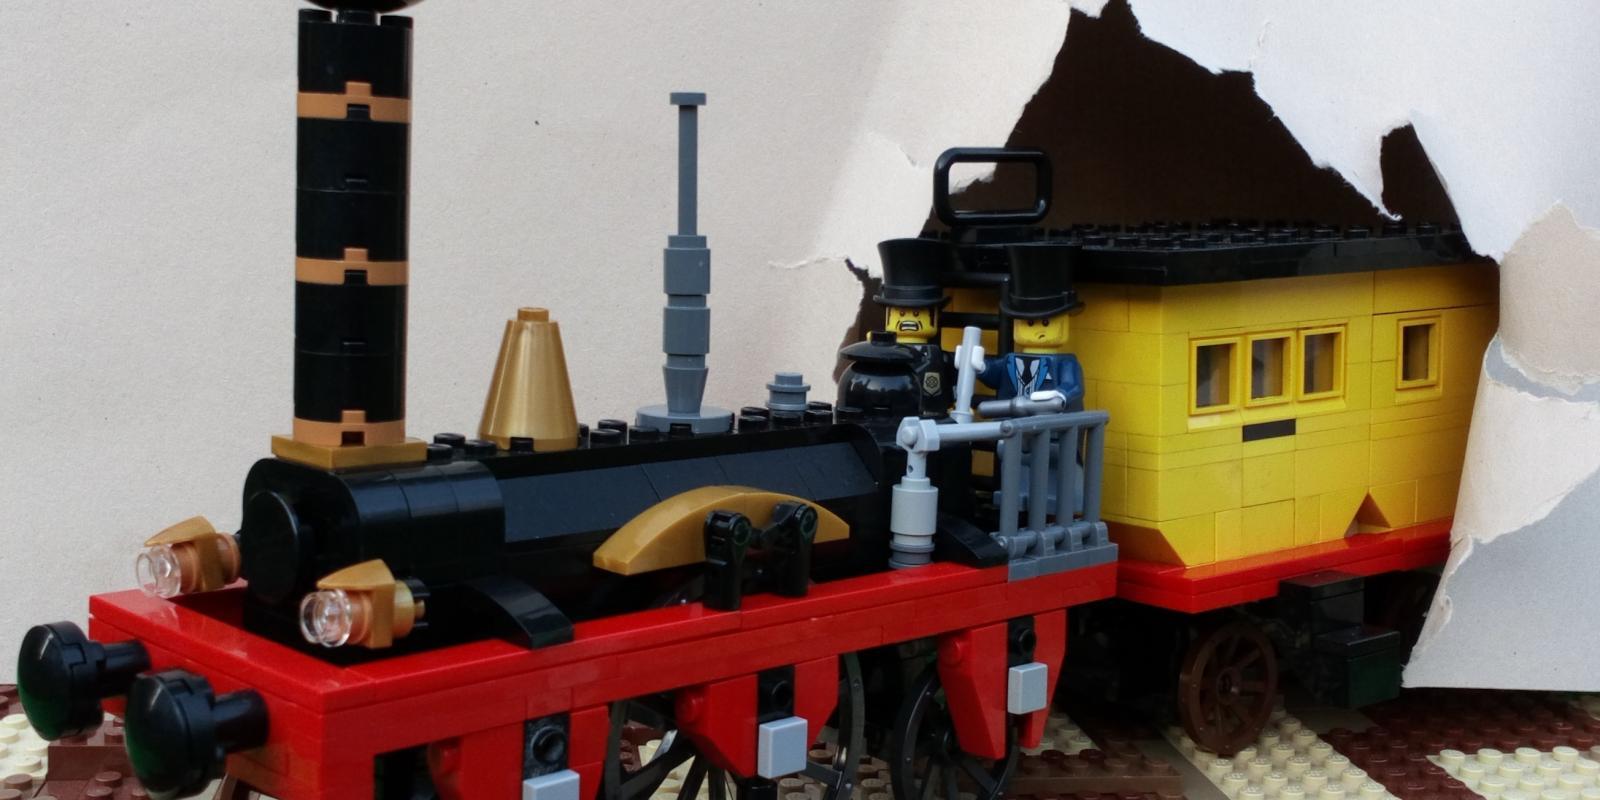 Iolanthe Lego Challenge